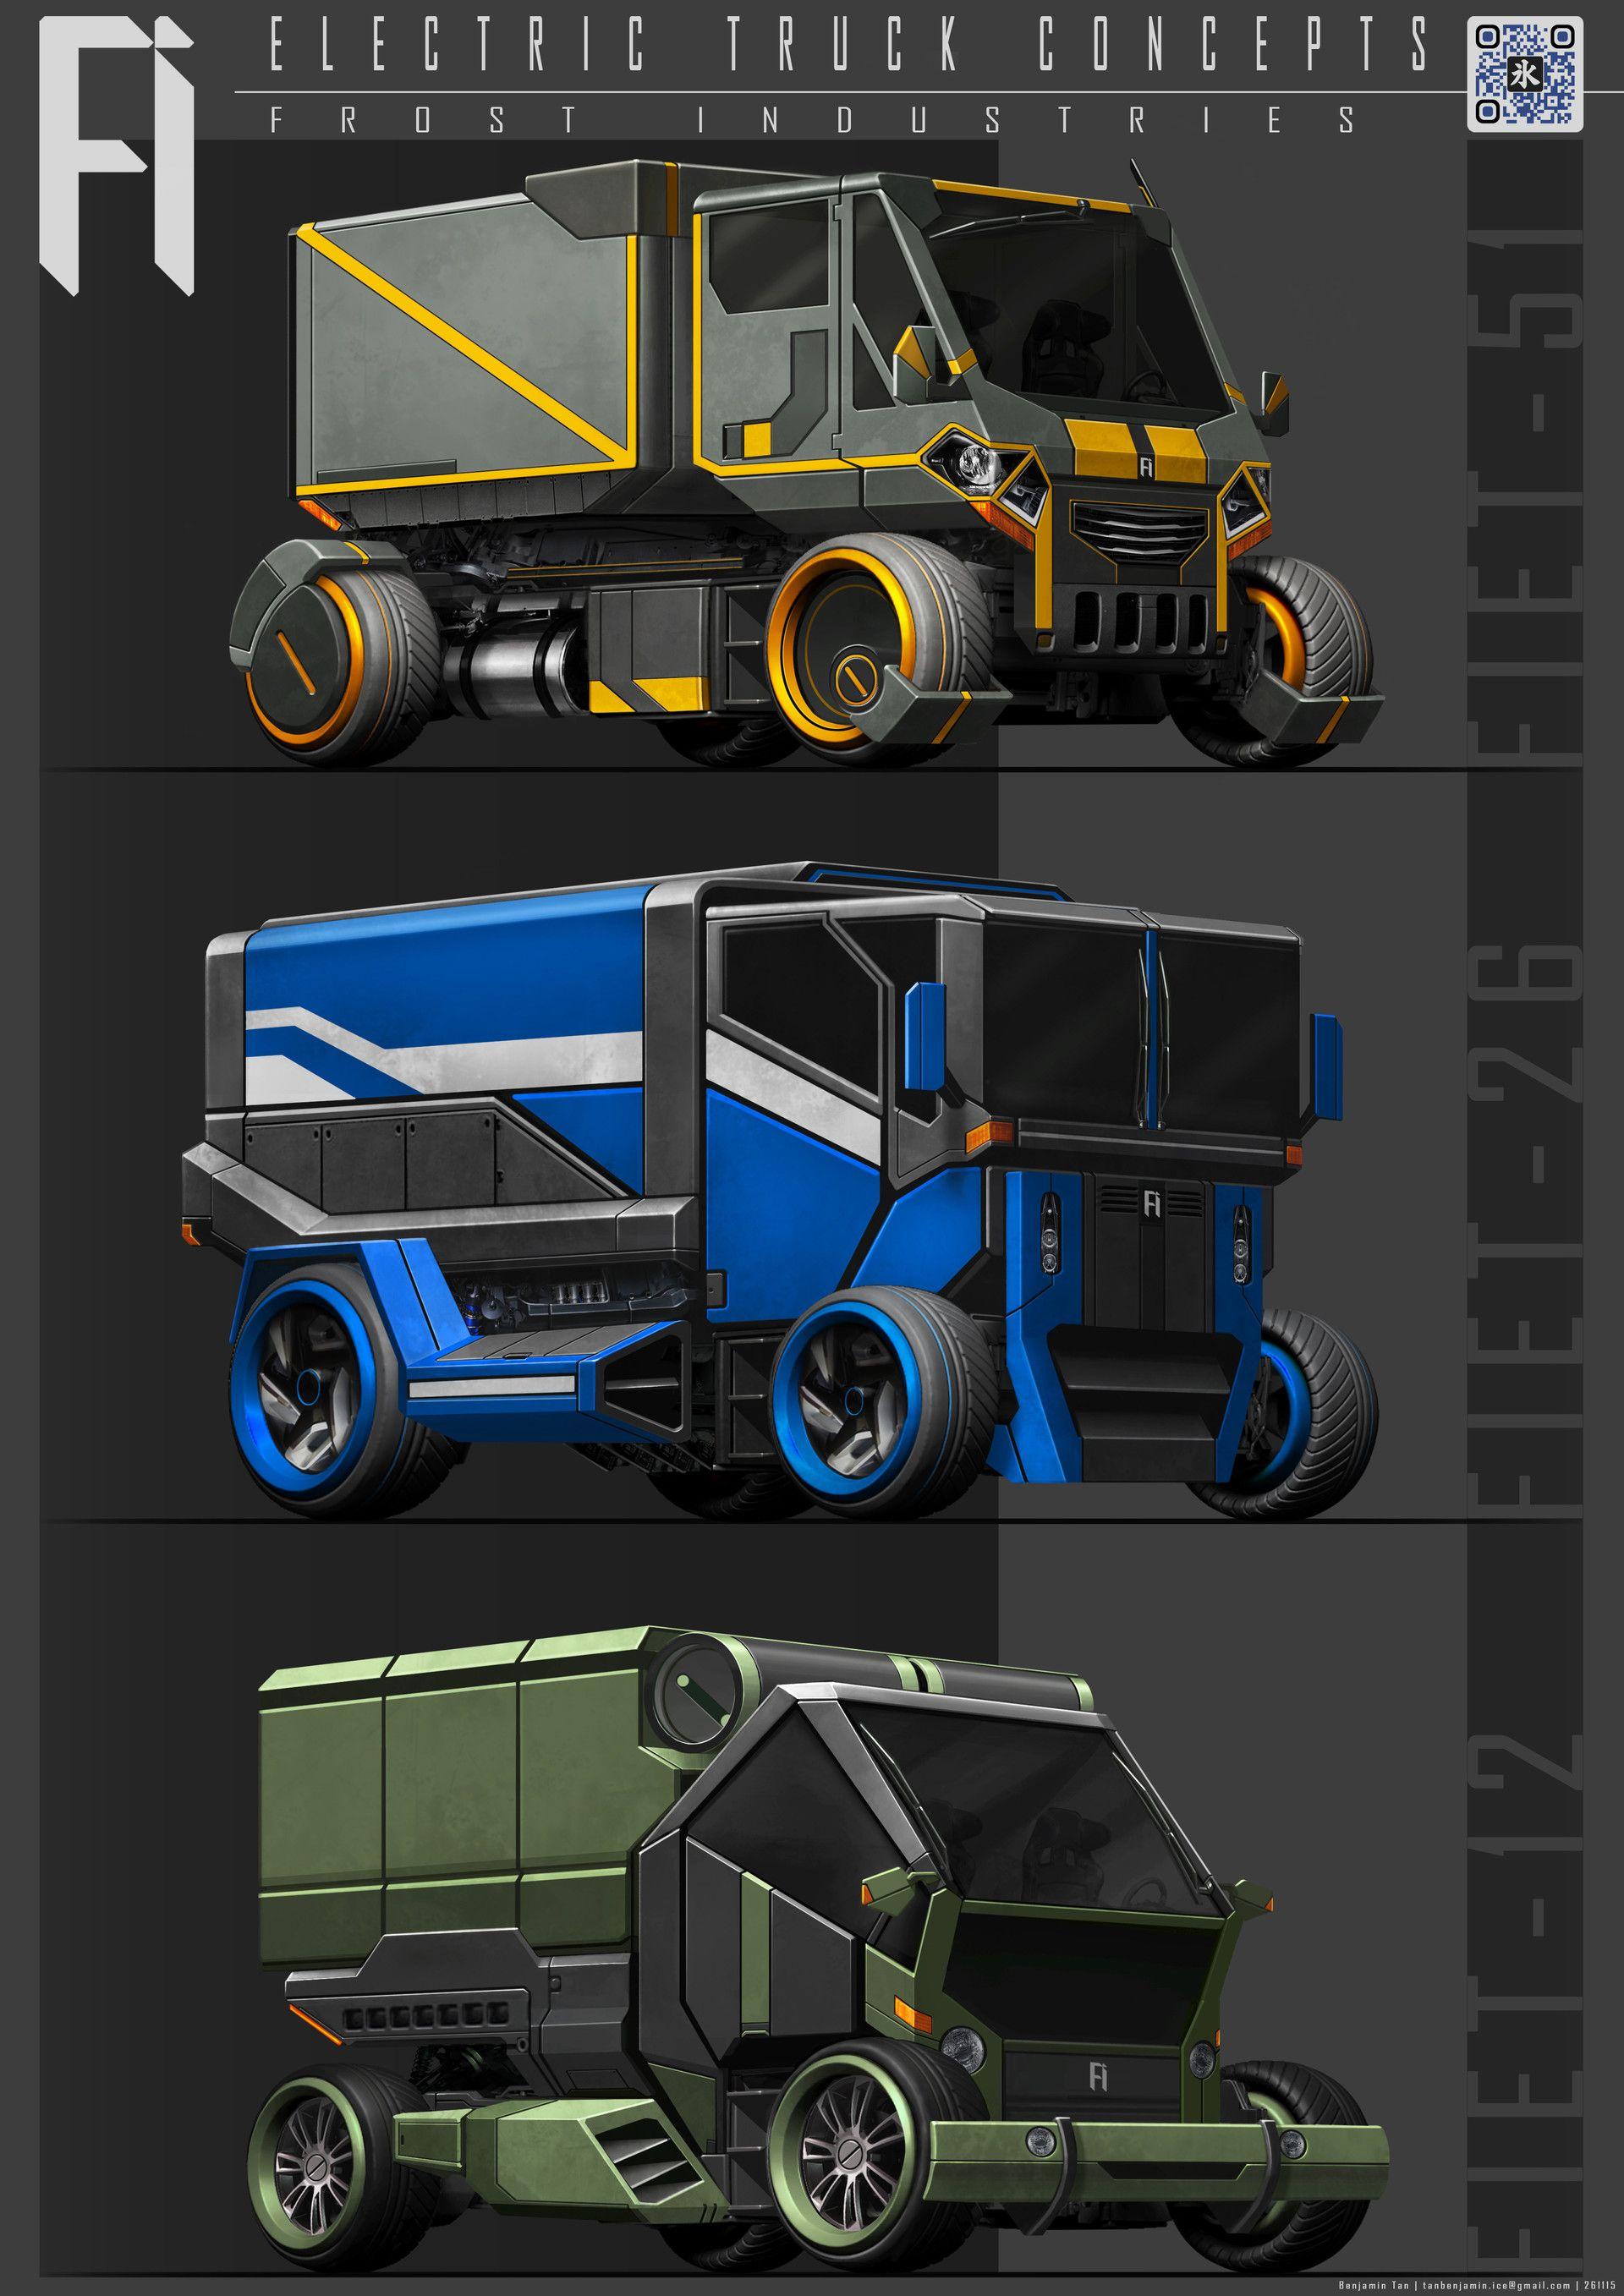 Electric Truck Concepts, Benjamin Tan